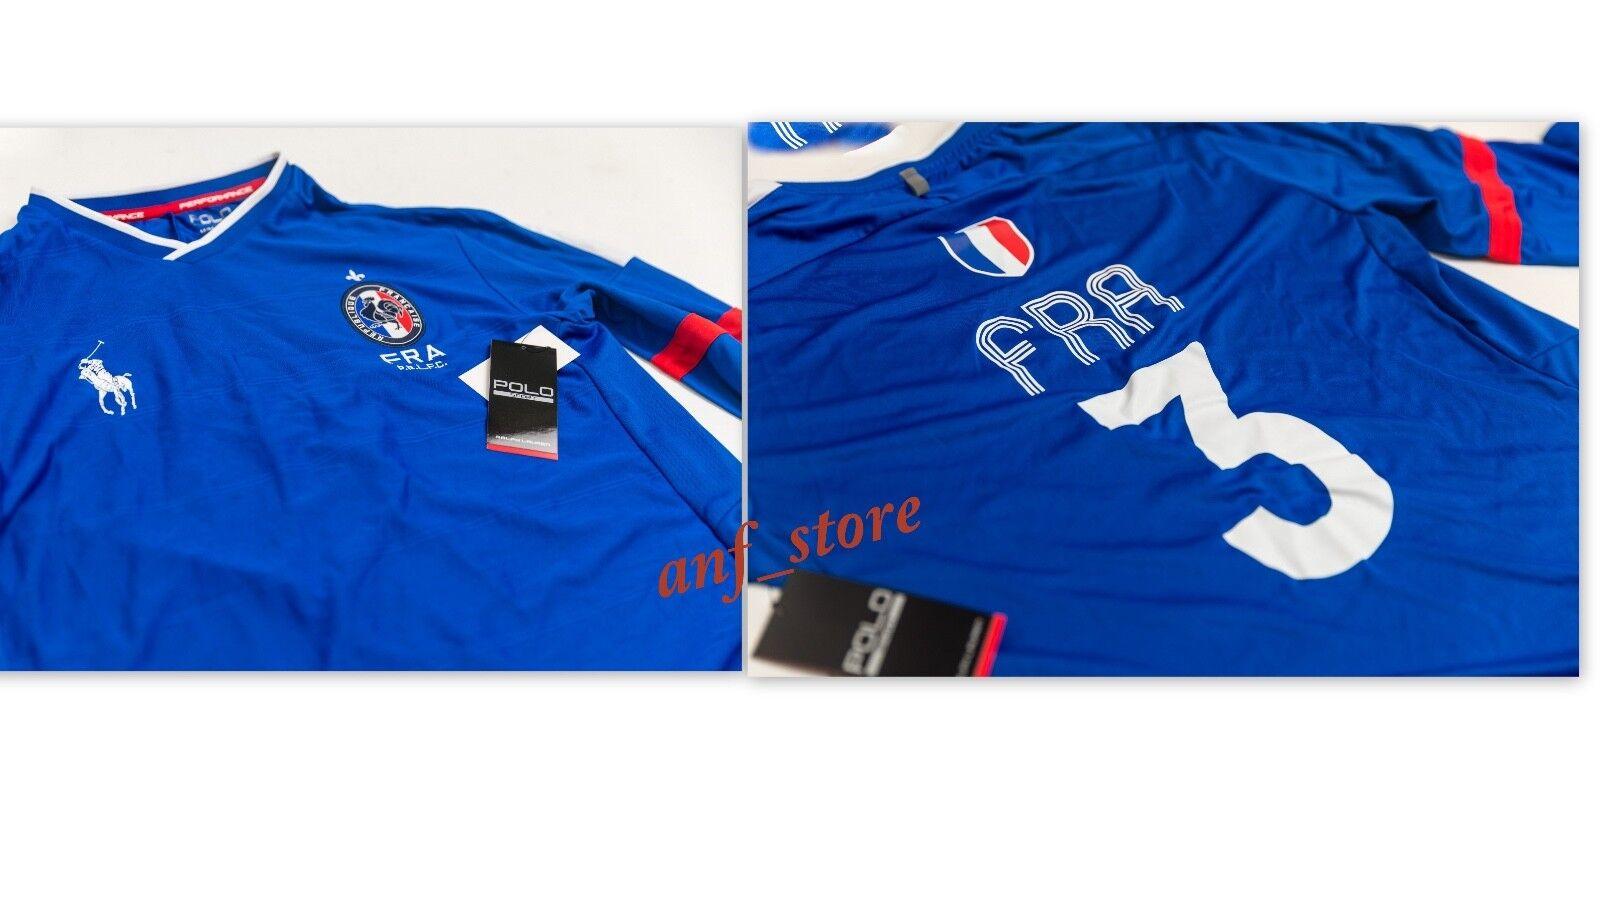 c3de7a1f NWT Ralph Lauren Polo RLX Performance FRANCE Mens L S Shirt L LARGE Soccer  norawv795-Casual Shirts & Tops